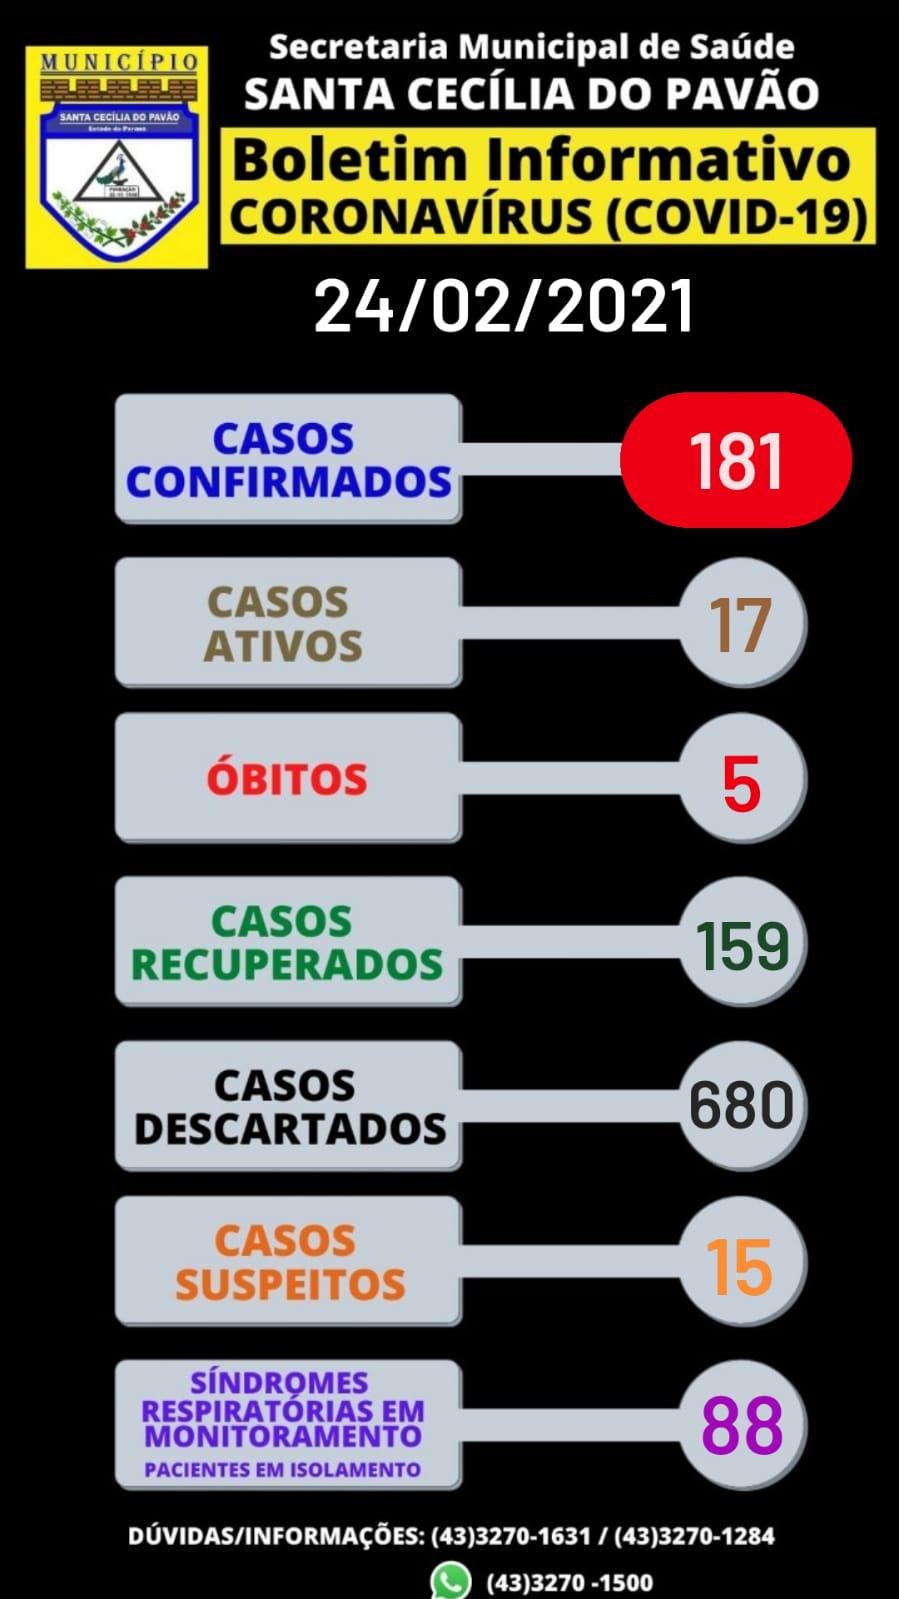 BOLETIM INFORMATIVO  CORONAVÍRUS (COVID 19) - 24/02/2021